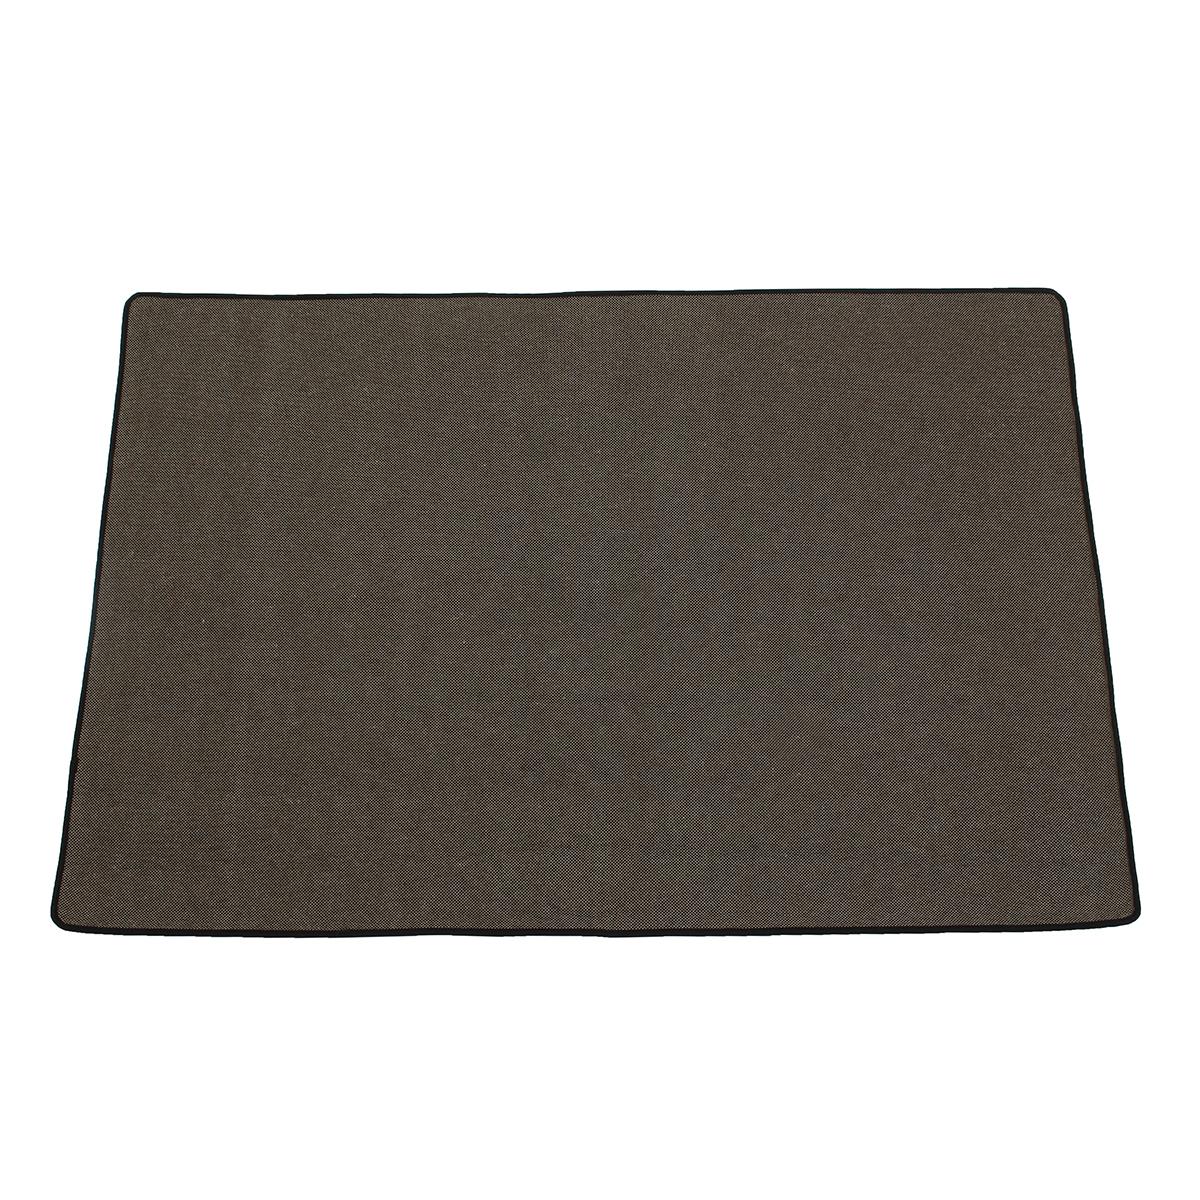 Rugs Amp Carpets Fashion Non Slip Shaggy Fluffy Area Rug